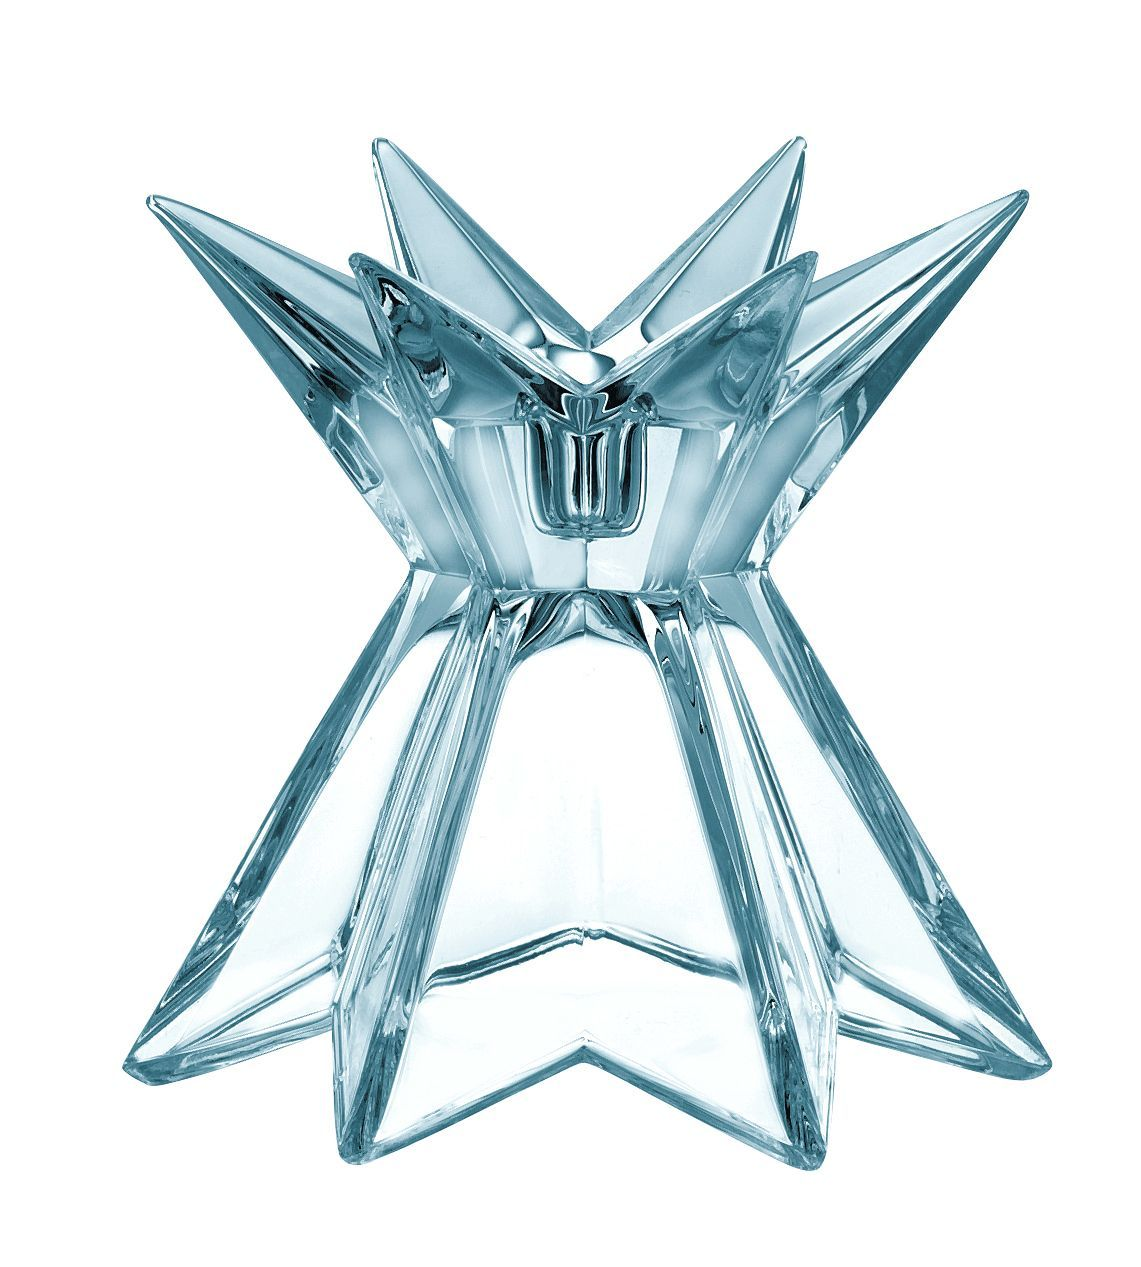 Подсвечники Подсвечник Nachtmann Crystal Christmas Galaxia podsvechnik-nachtmann-crystal-christmas-galaxia-germaniya.jpg